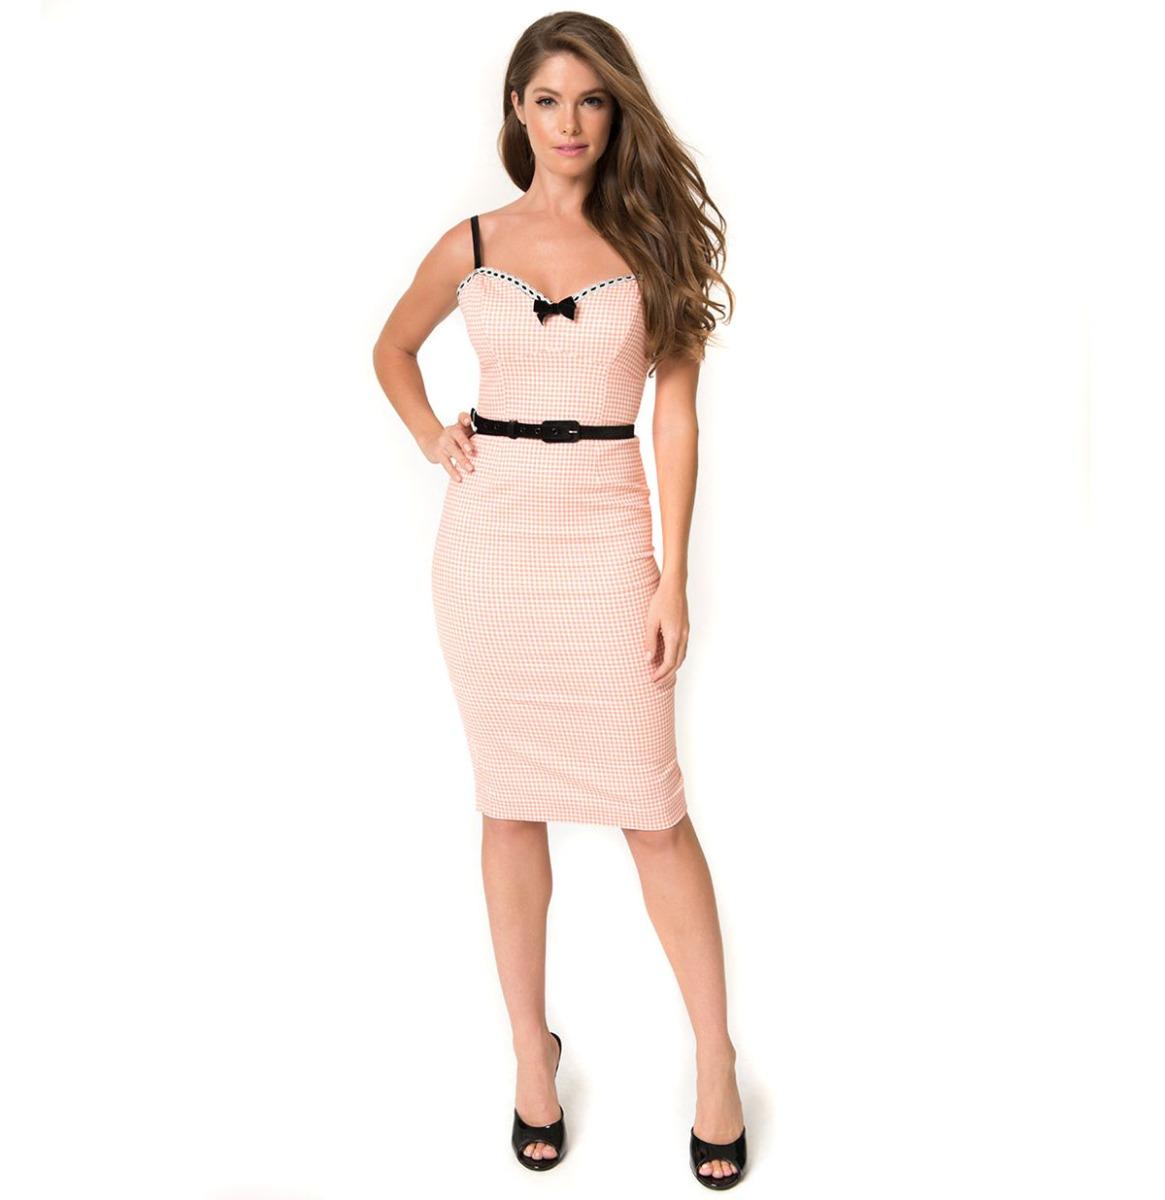 Lilli Pencil Dress Roze Gingham